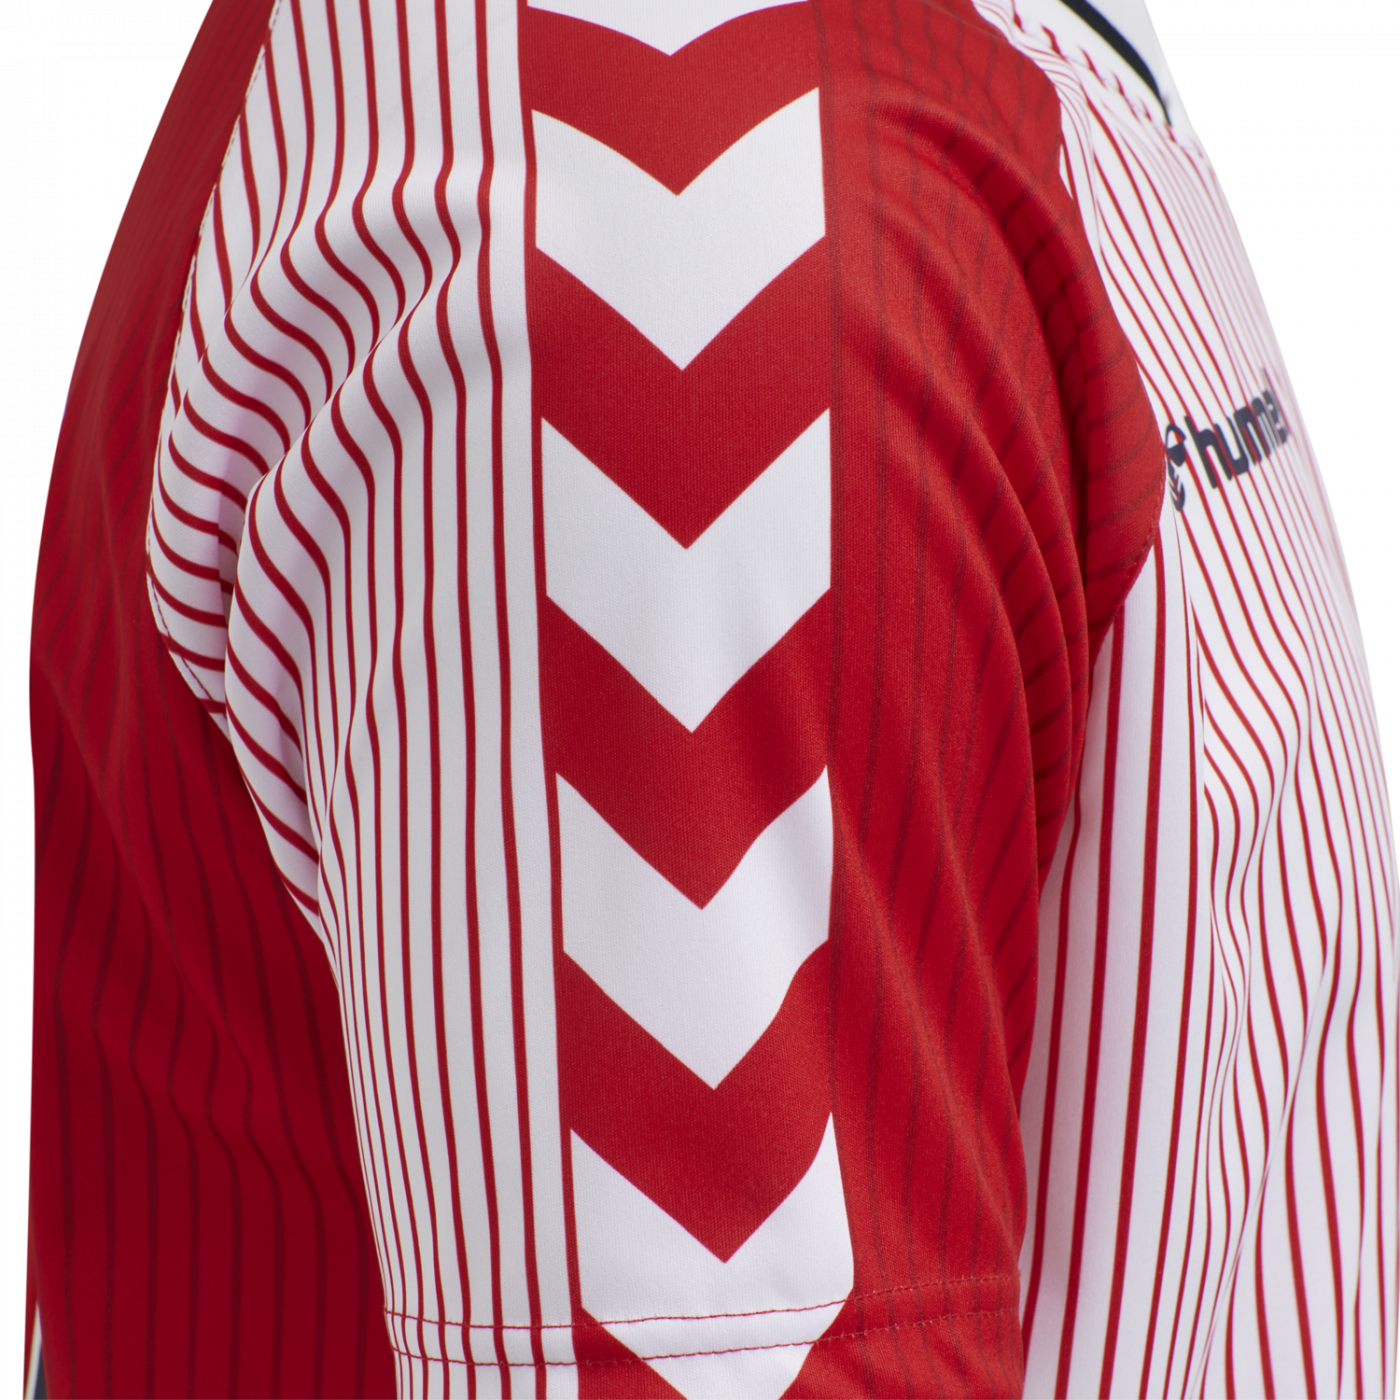 maillot-danemark-1986-hummel-reedition-2